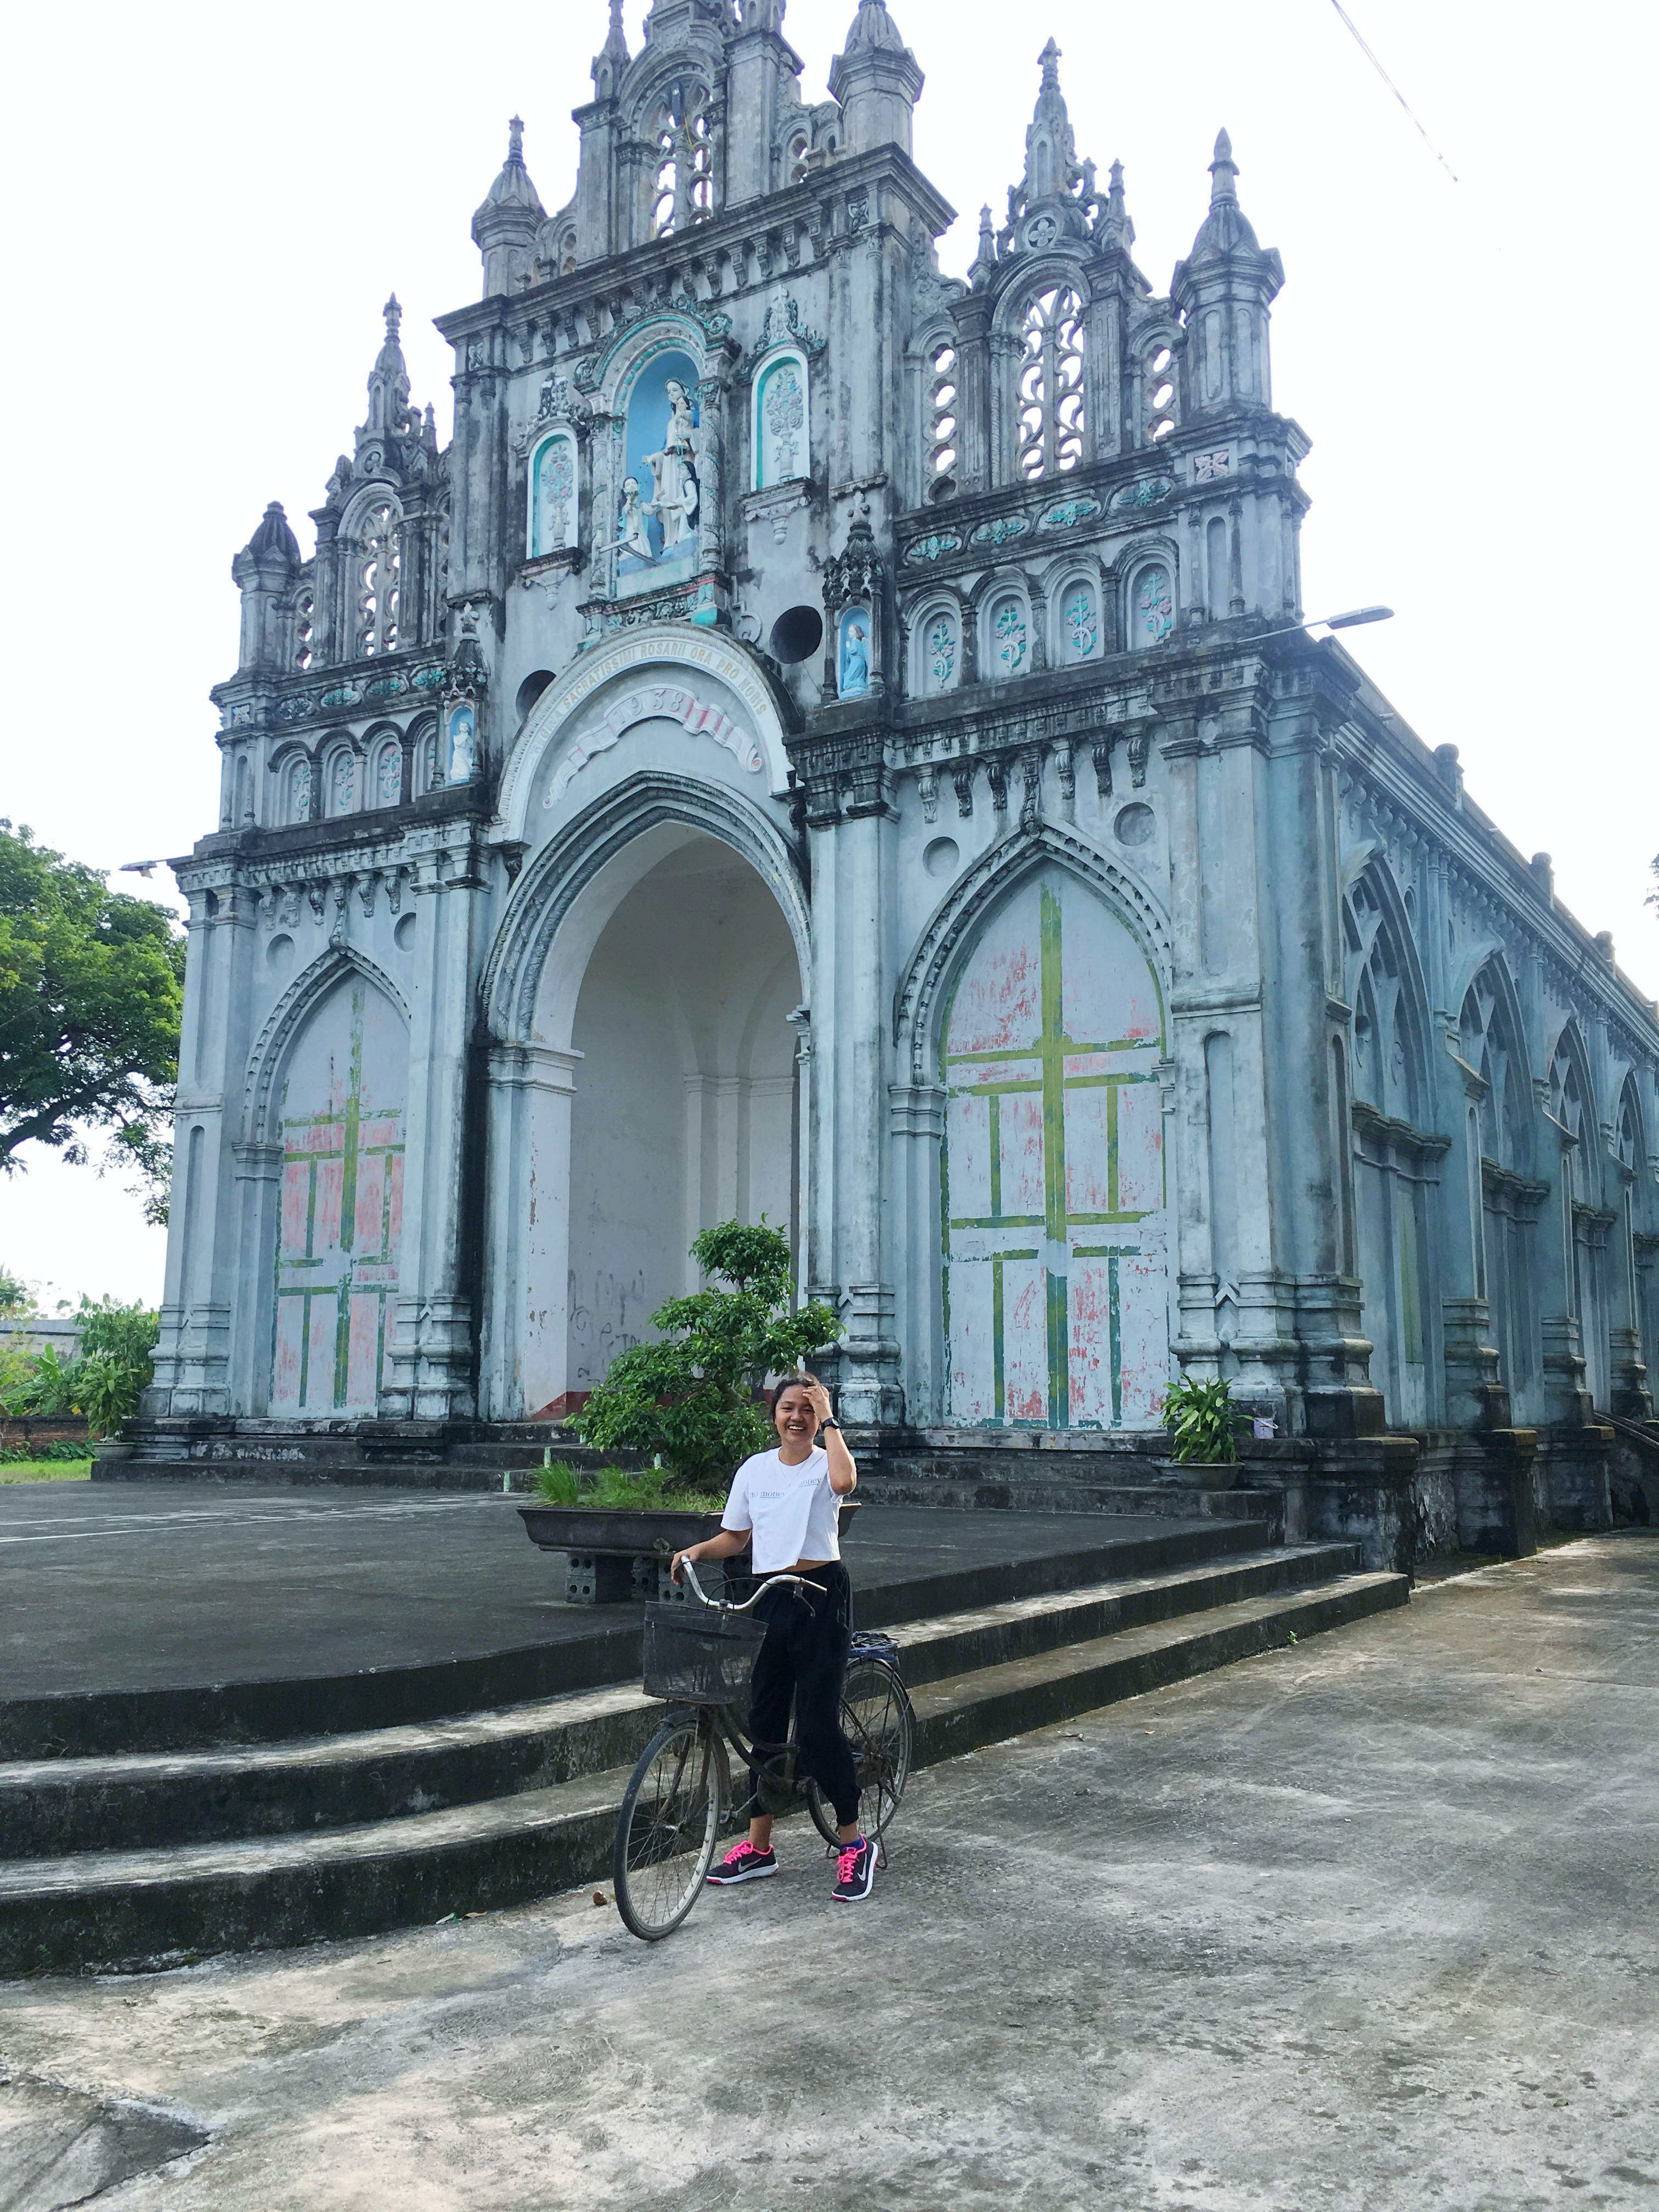 Thai Bihn Province (1) - Roneth